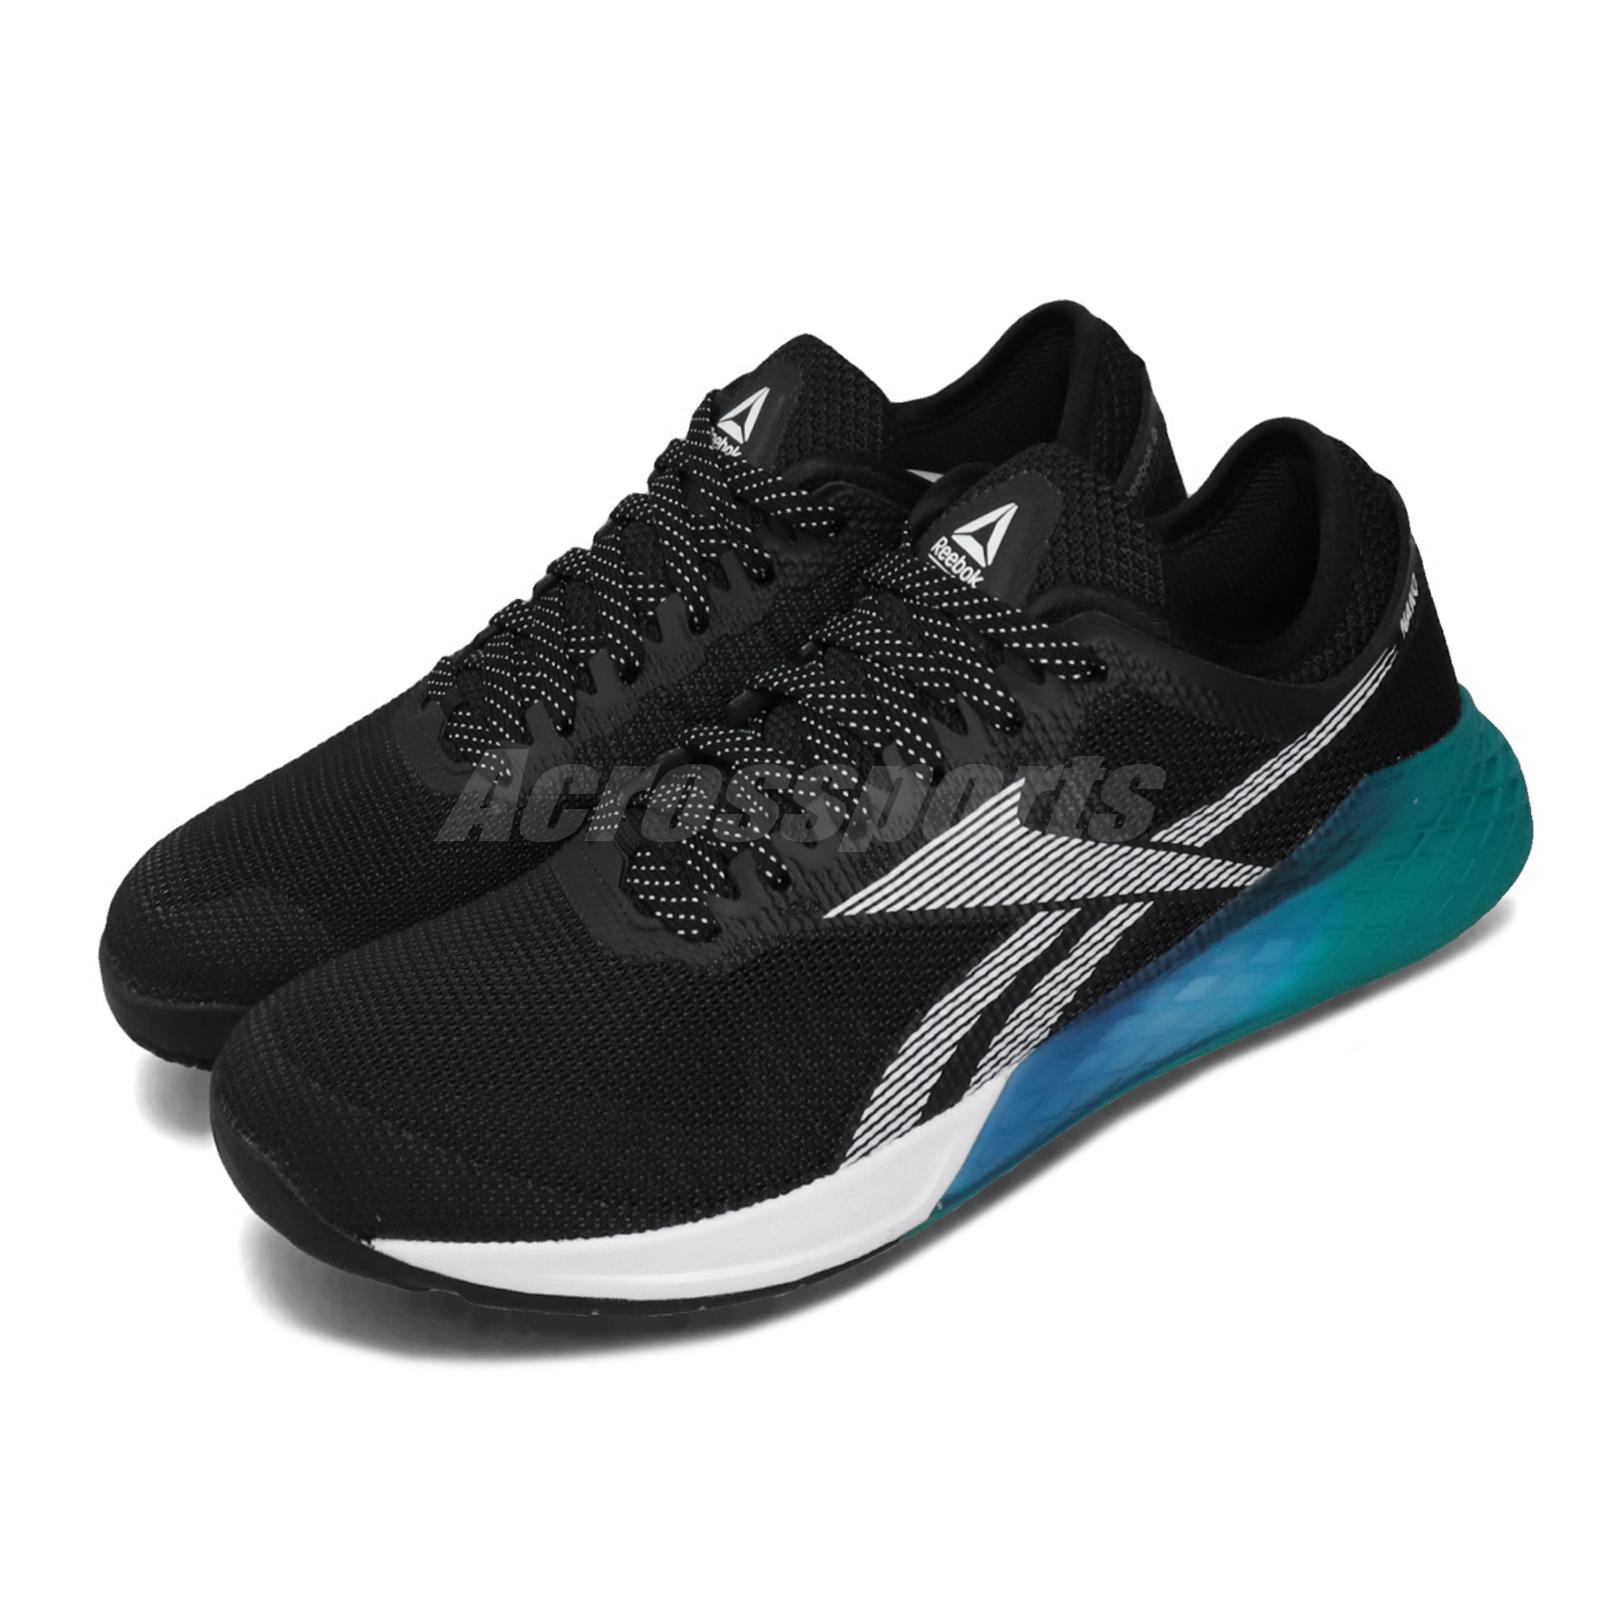 Reebok Nano 9 Black Teal Blue White Men CrossFit Training Shoes Sneakers FU7564